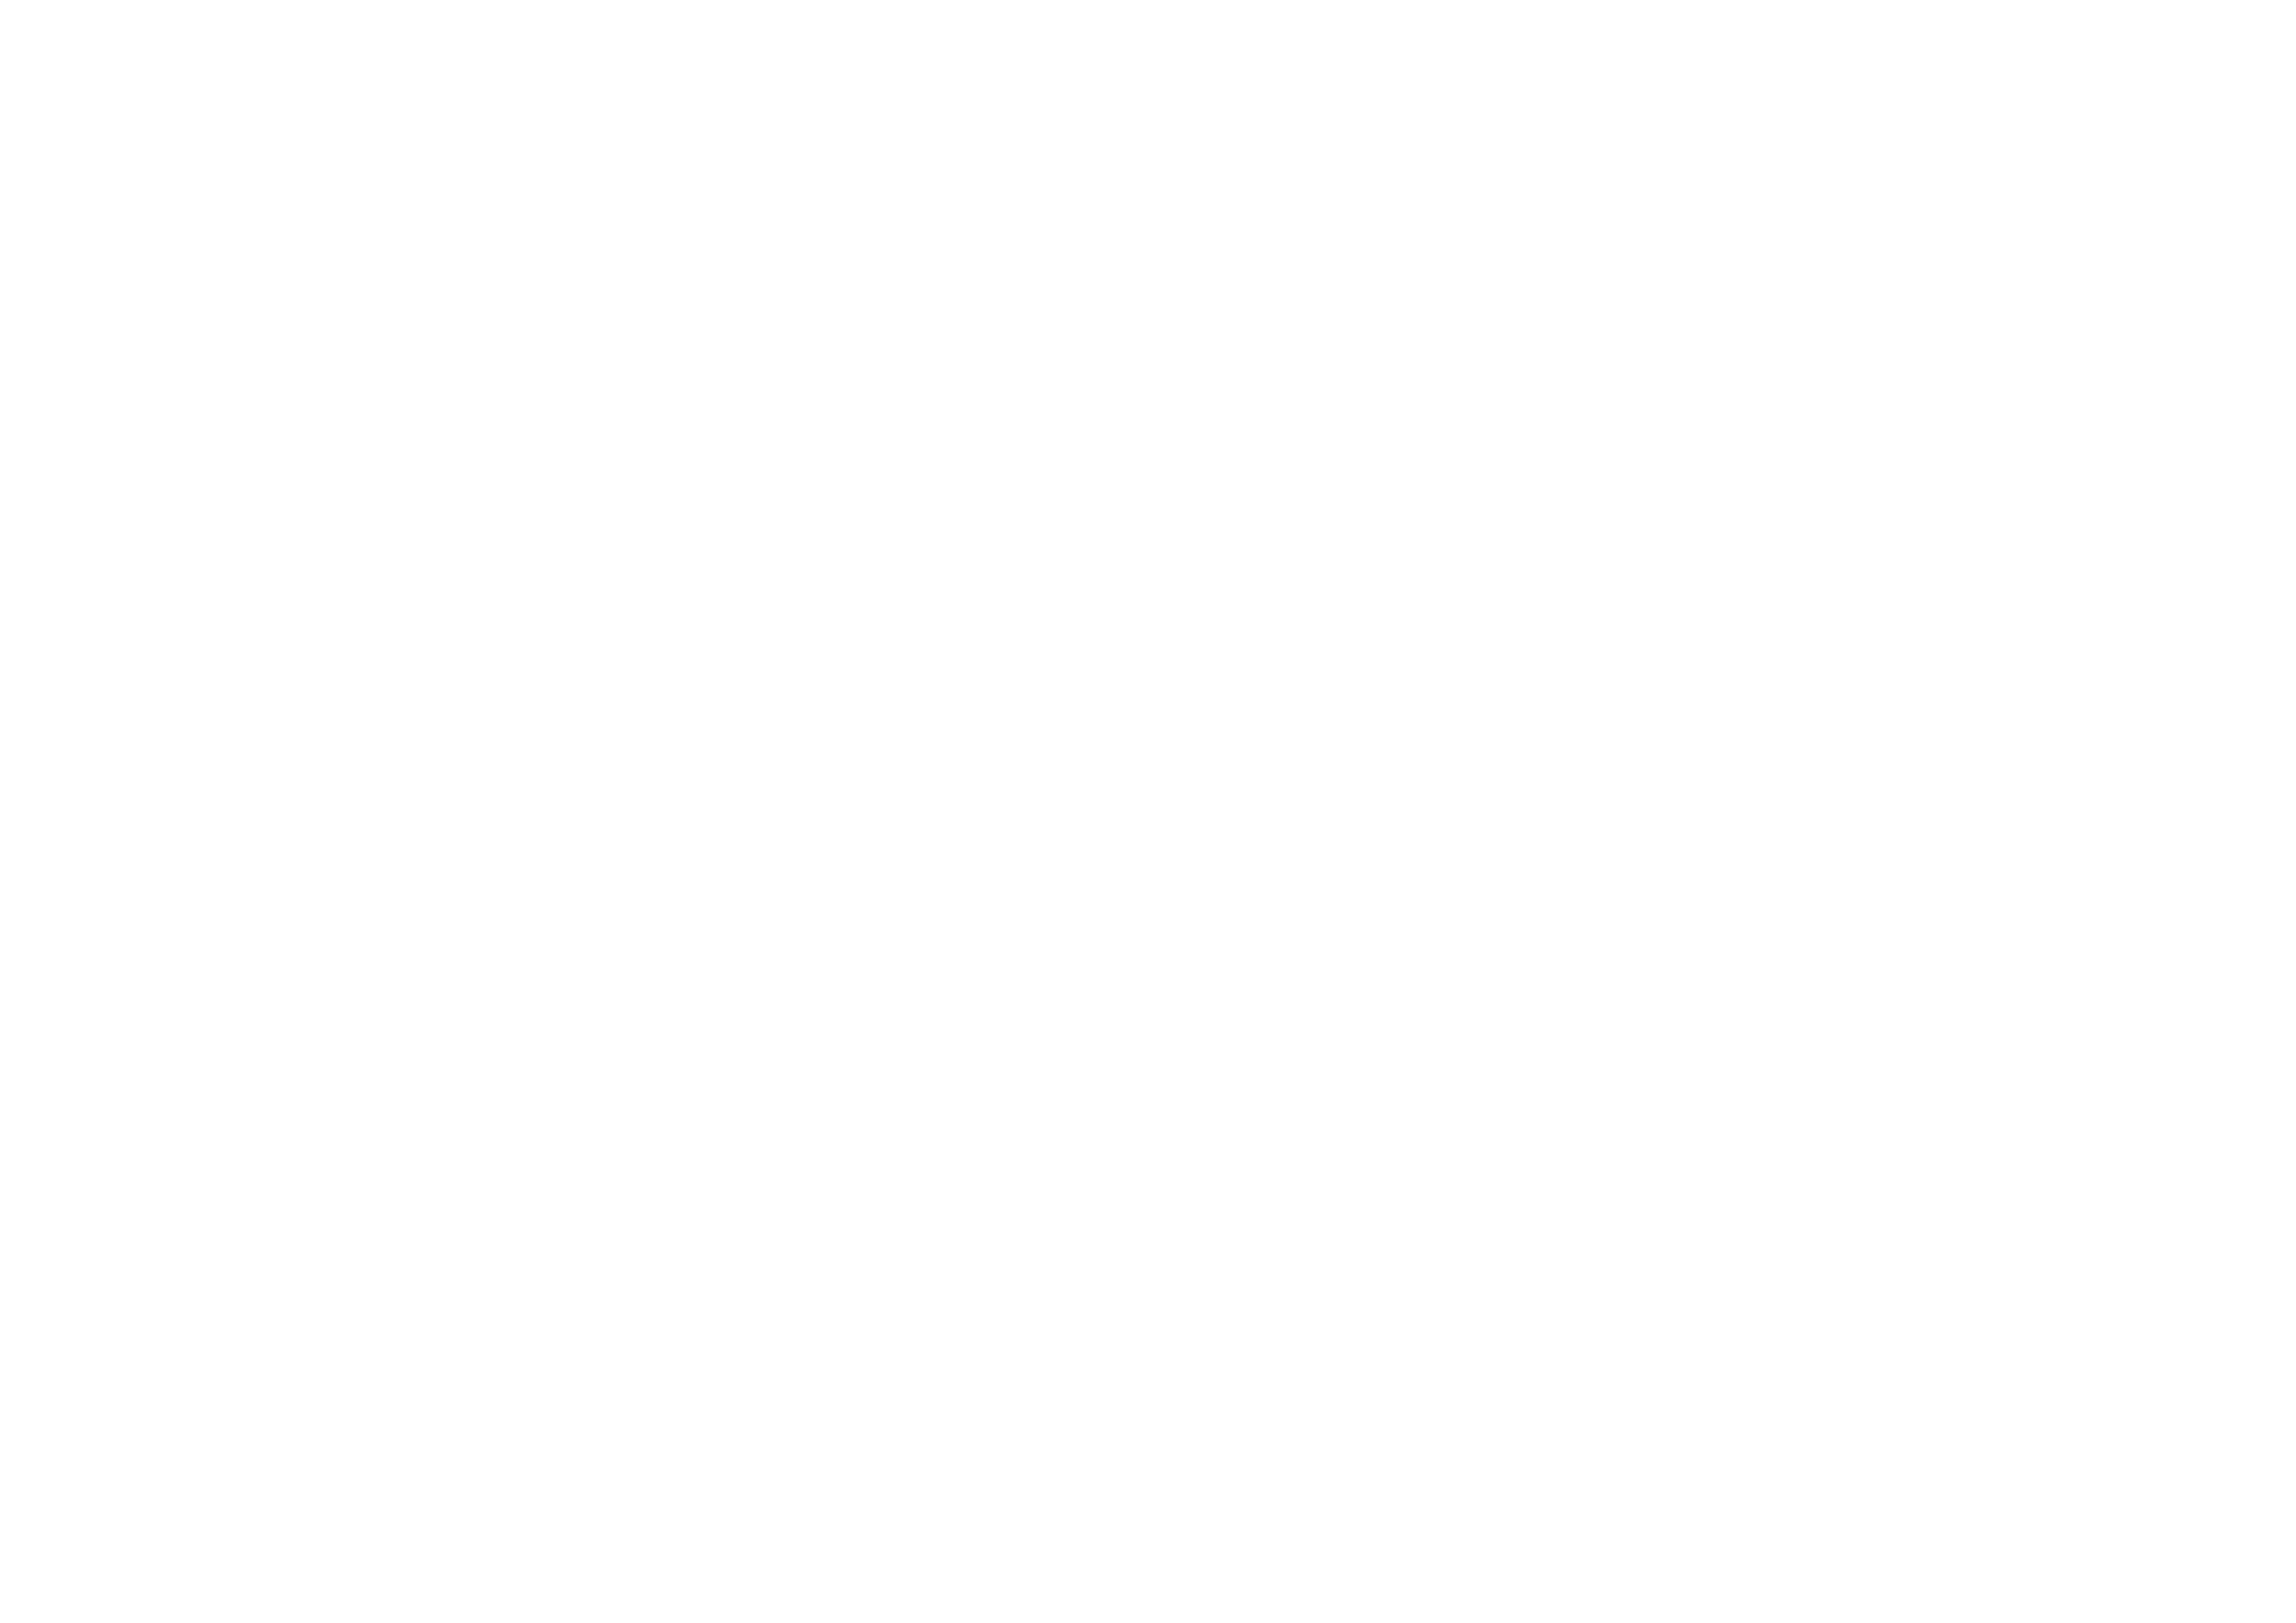 Chalet Machapuchare, Luxury Ski Chalet from Camel Snow